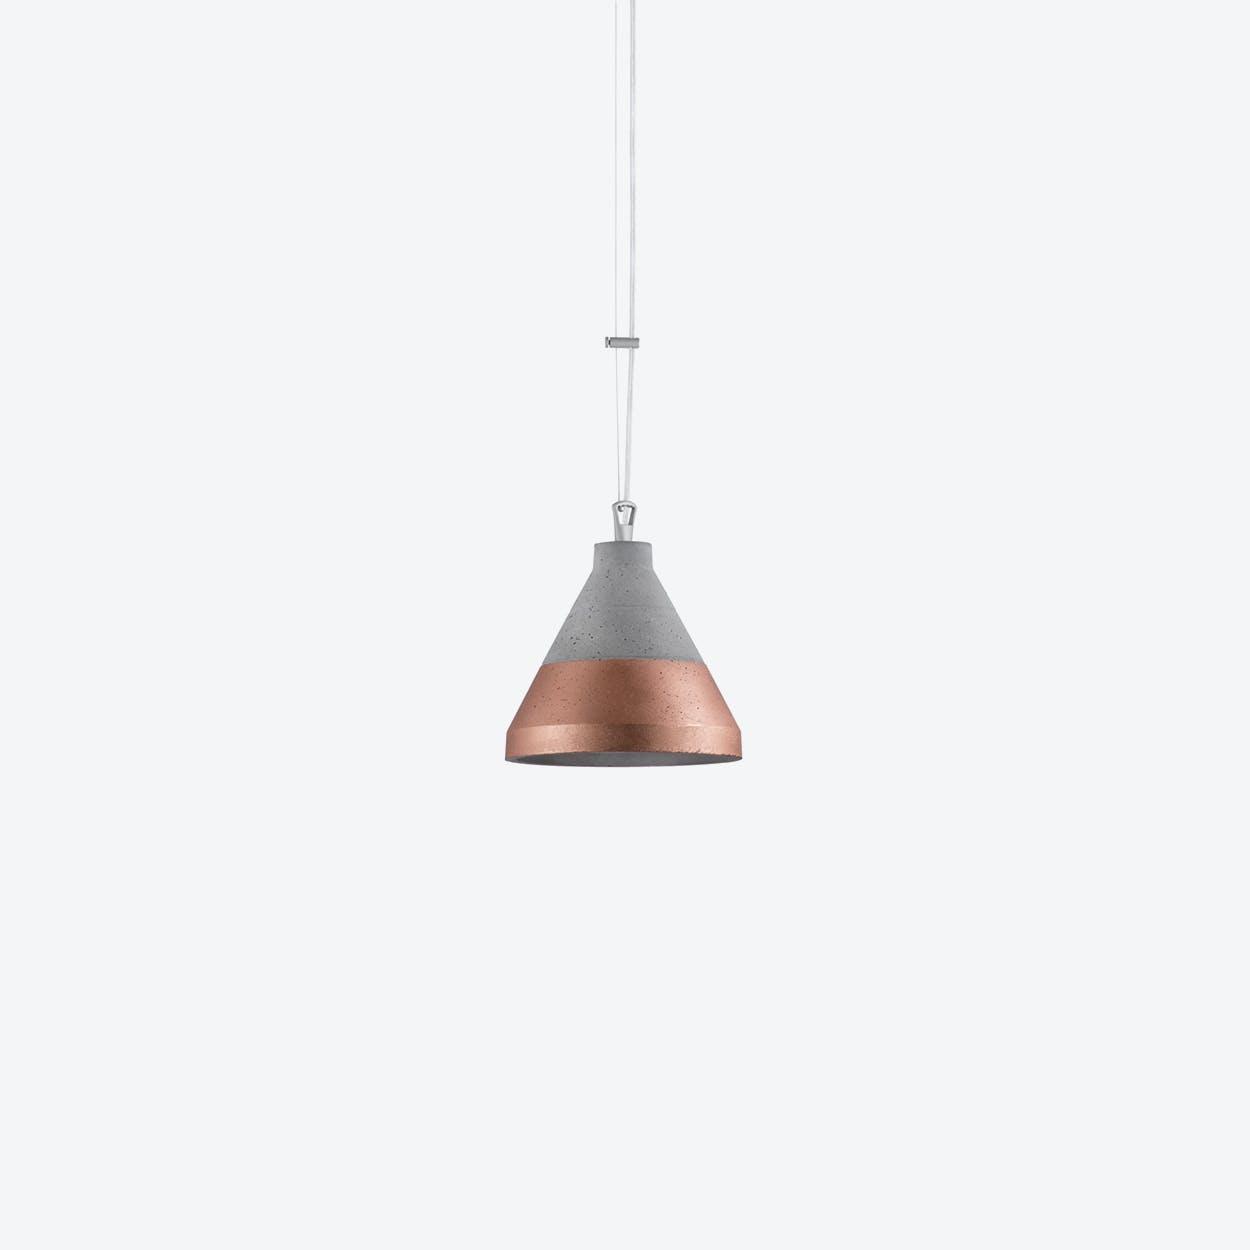 Craft Pendant Lamp in Copper / Down